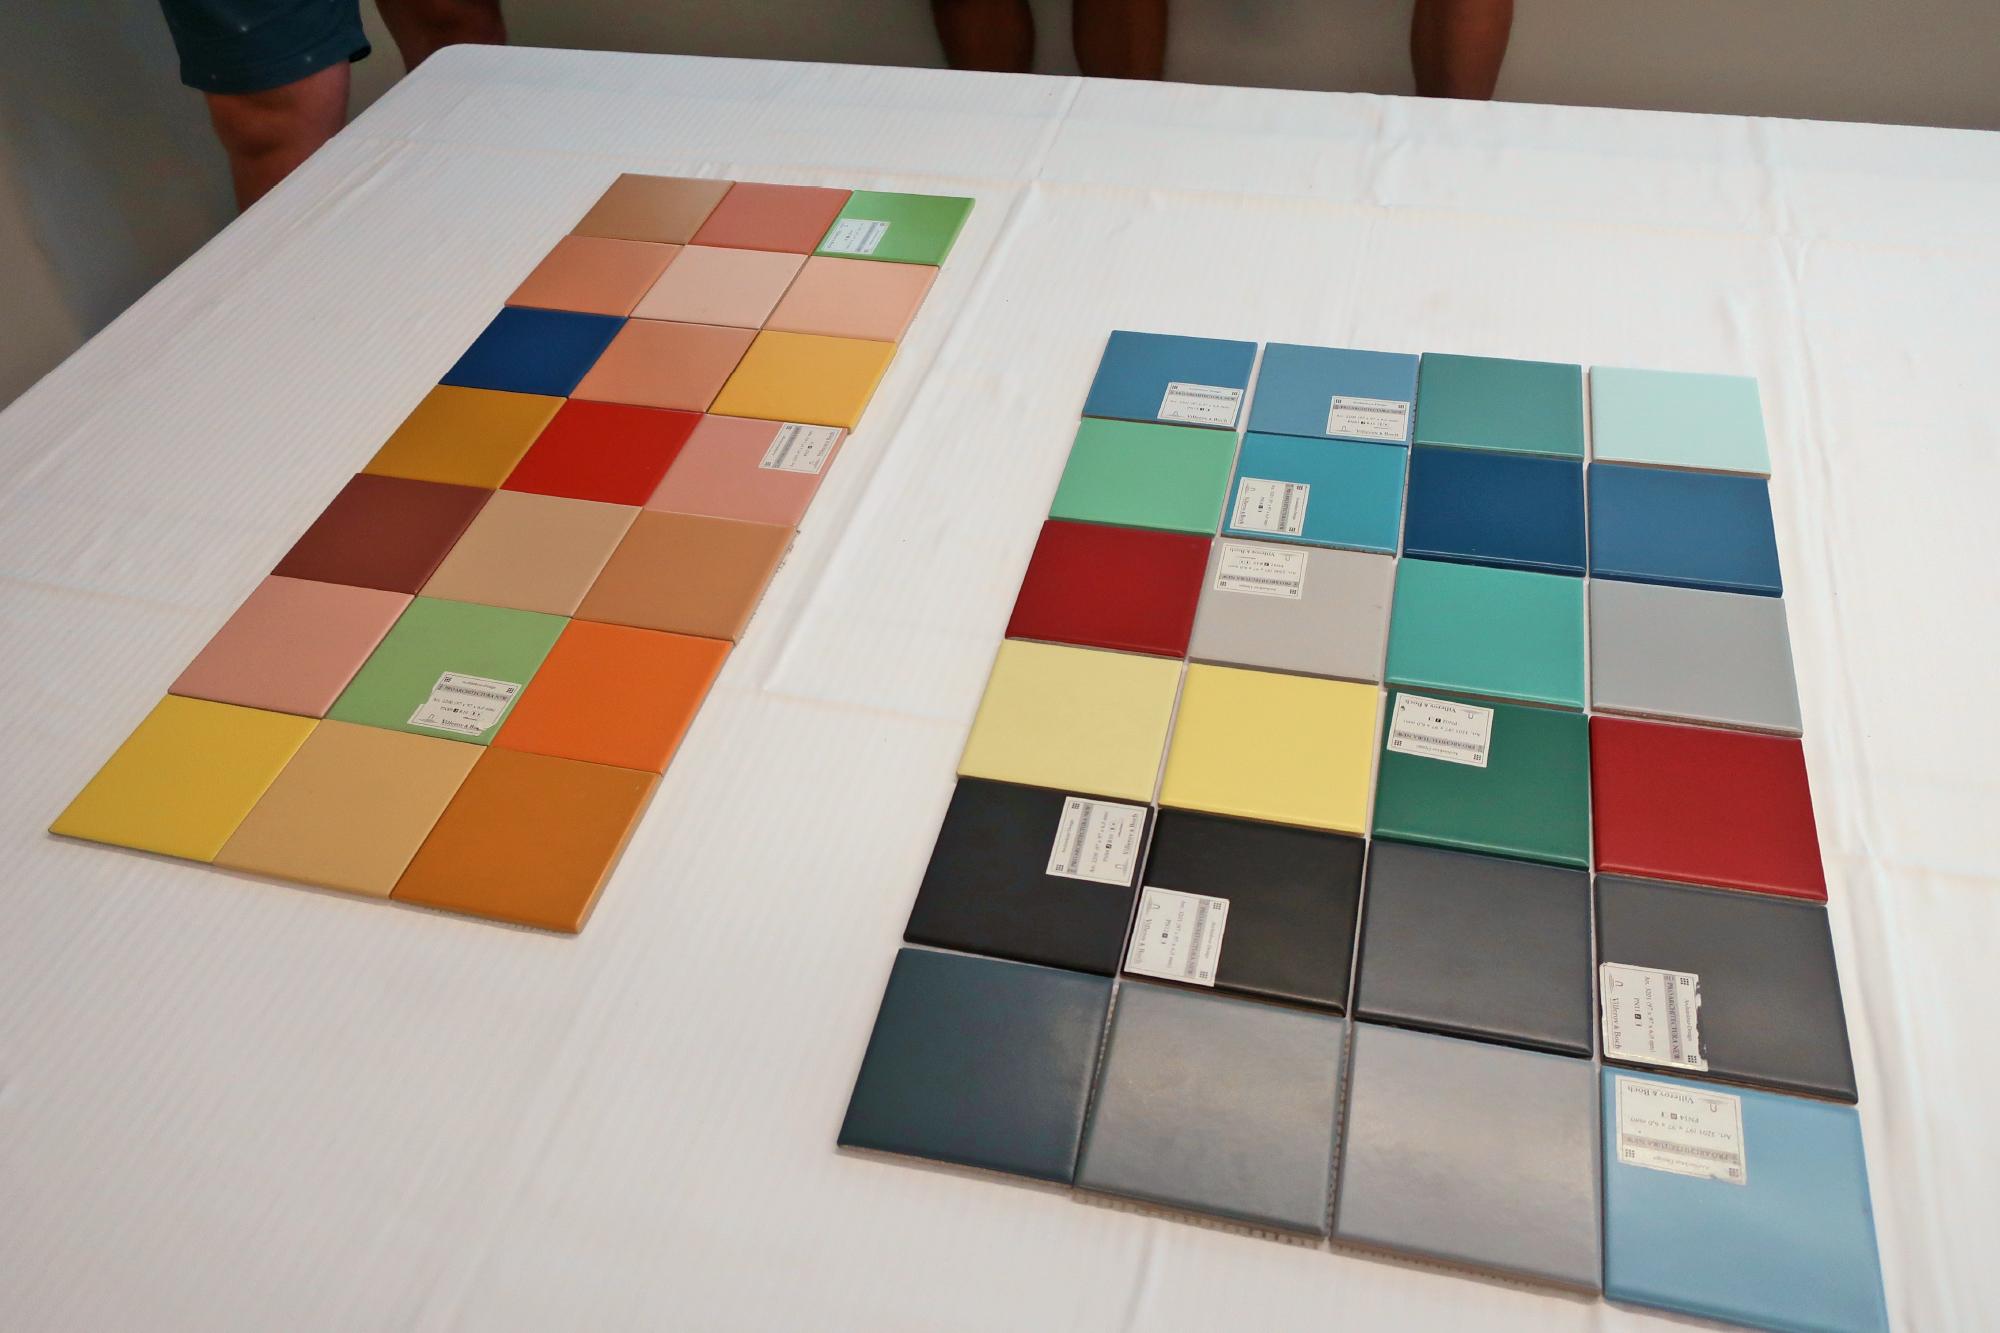 Schulung-Farbe-Raumgestaltung-Farbkonzept